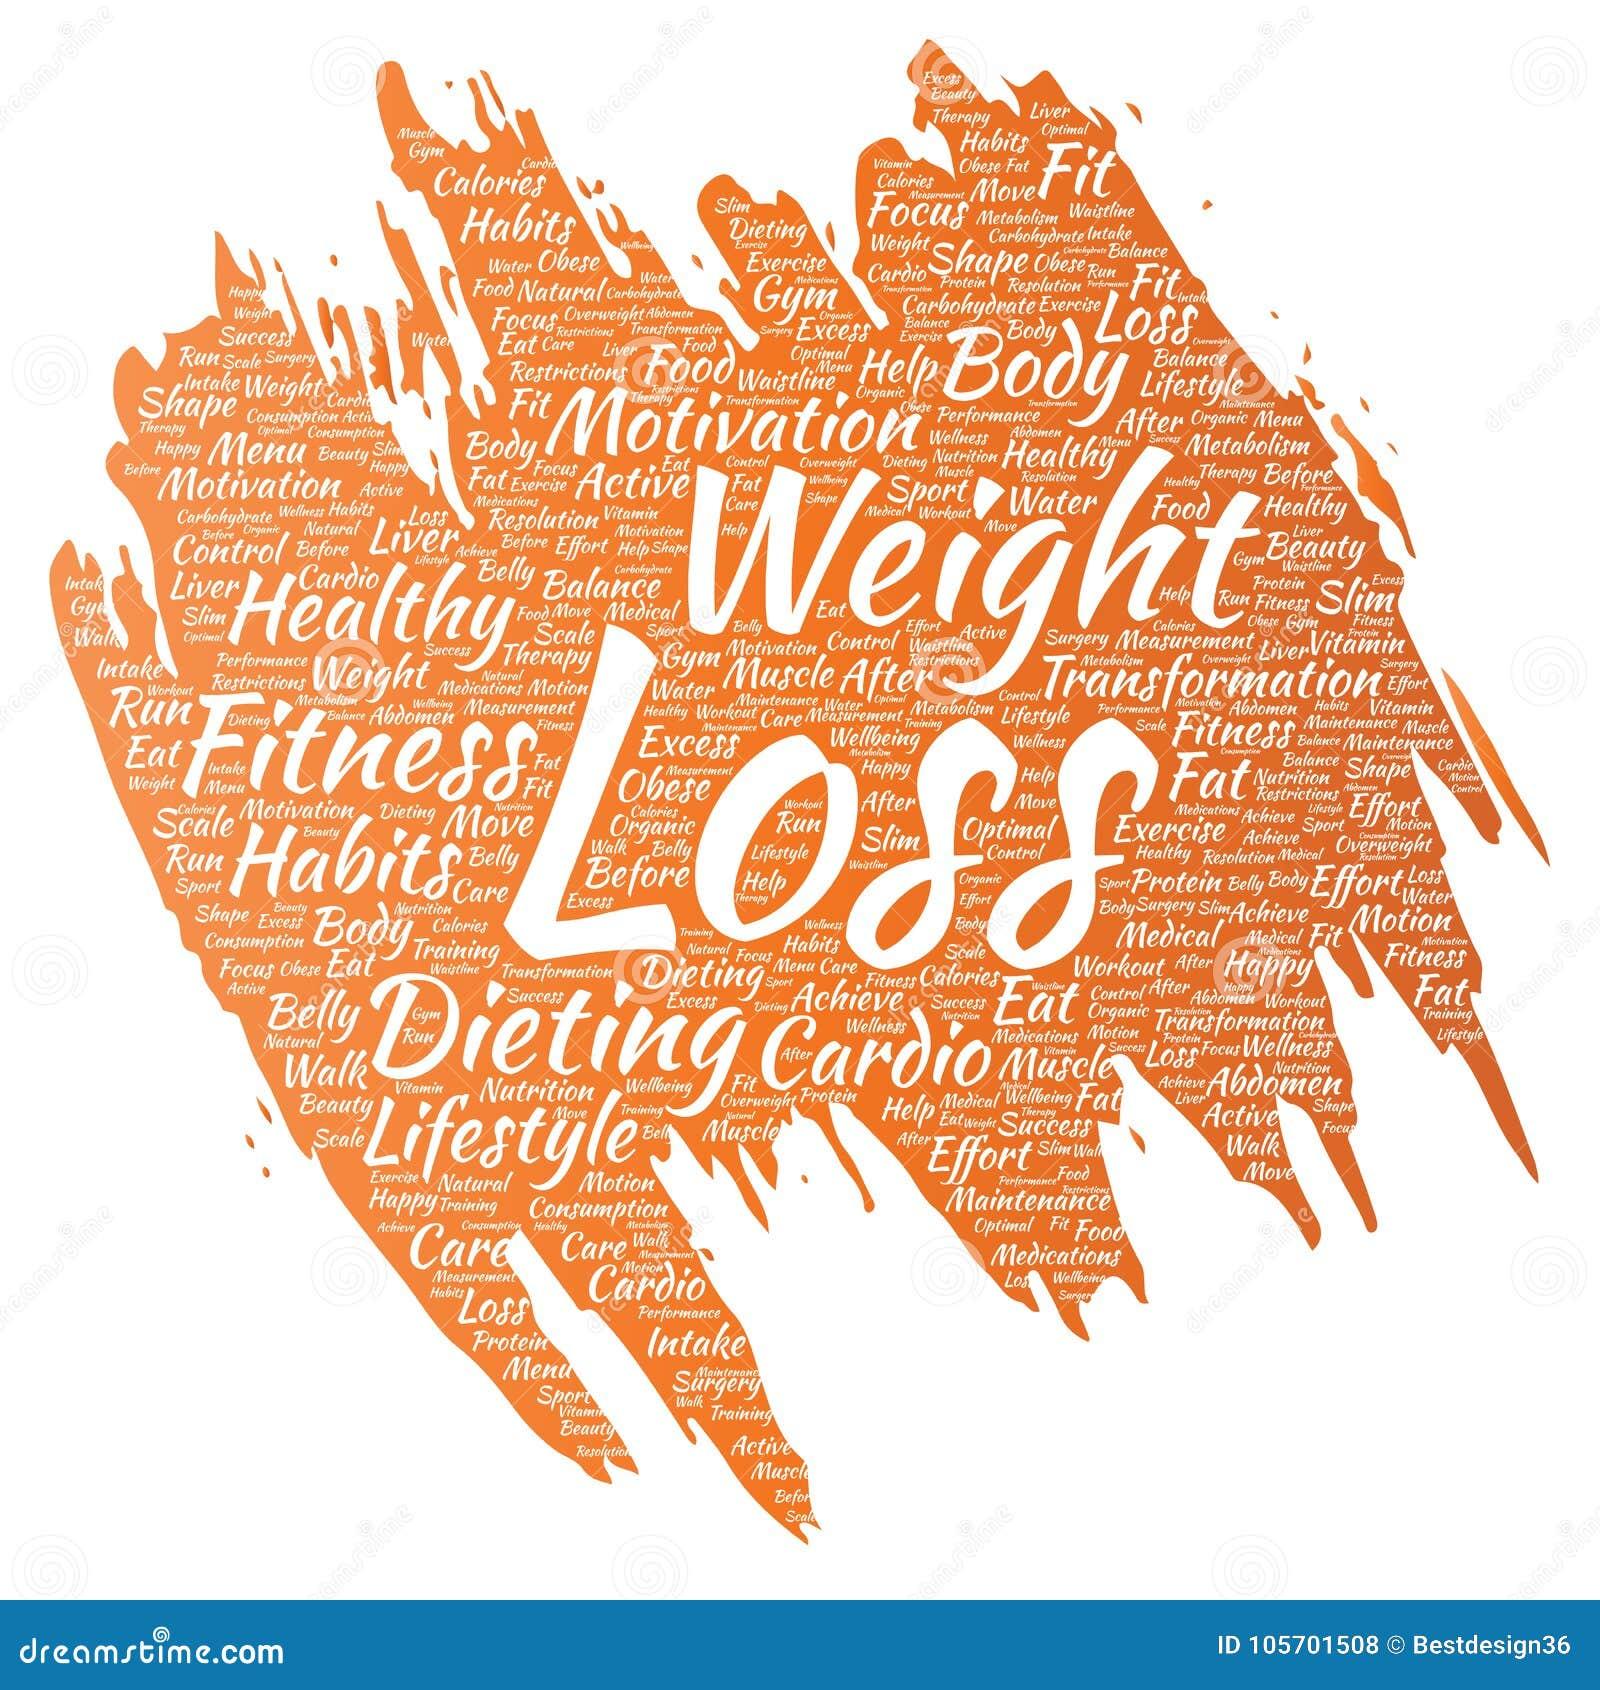 segni di motivazione di perdita di peso